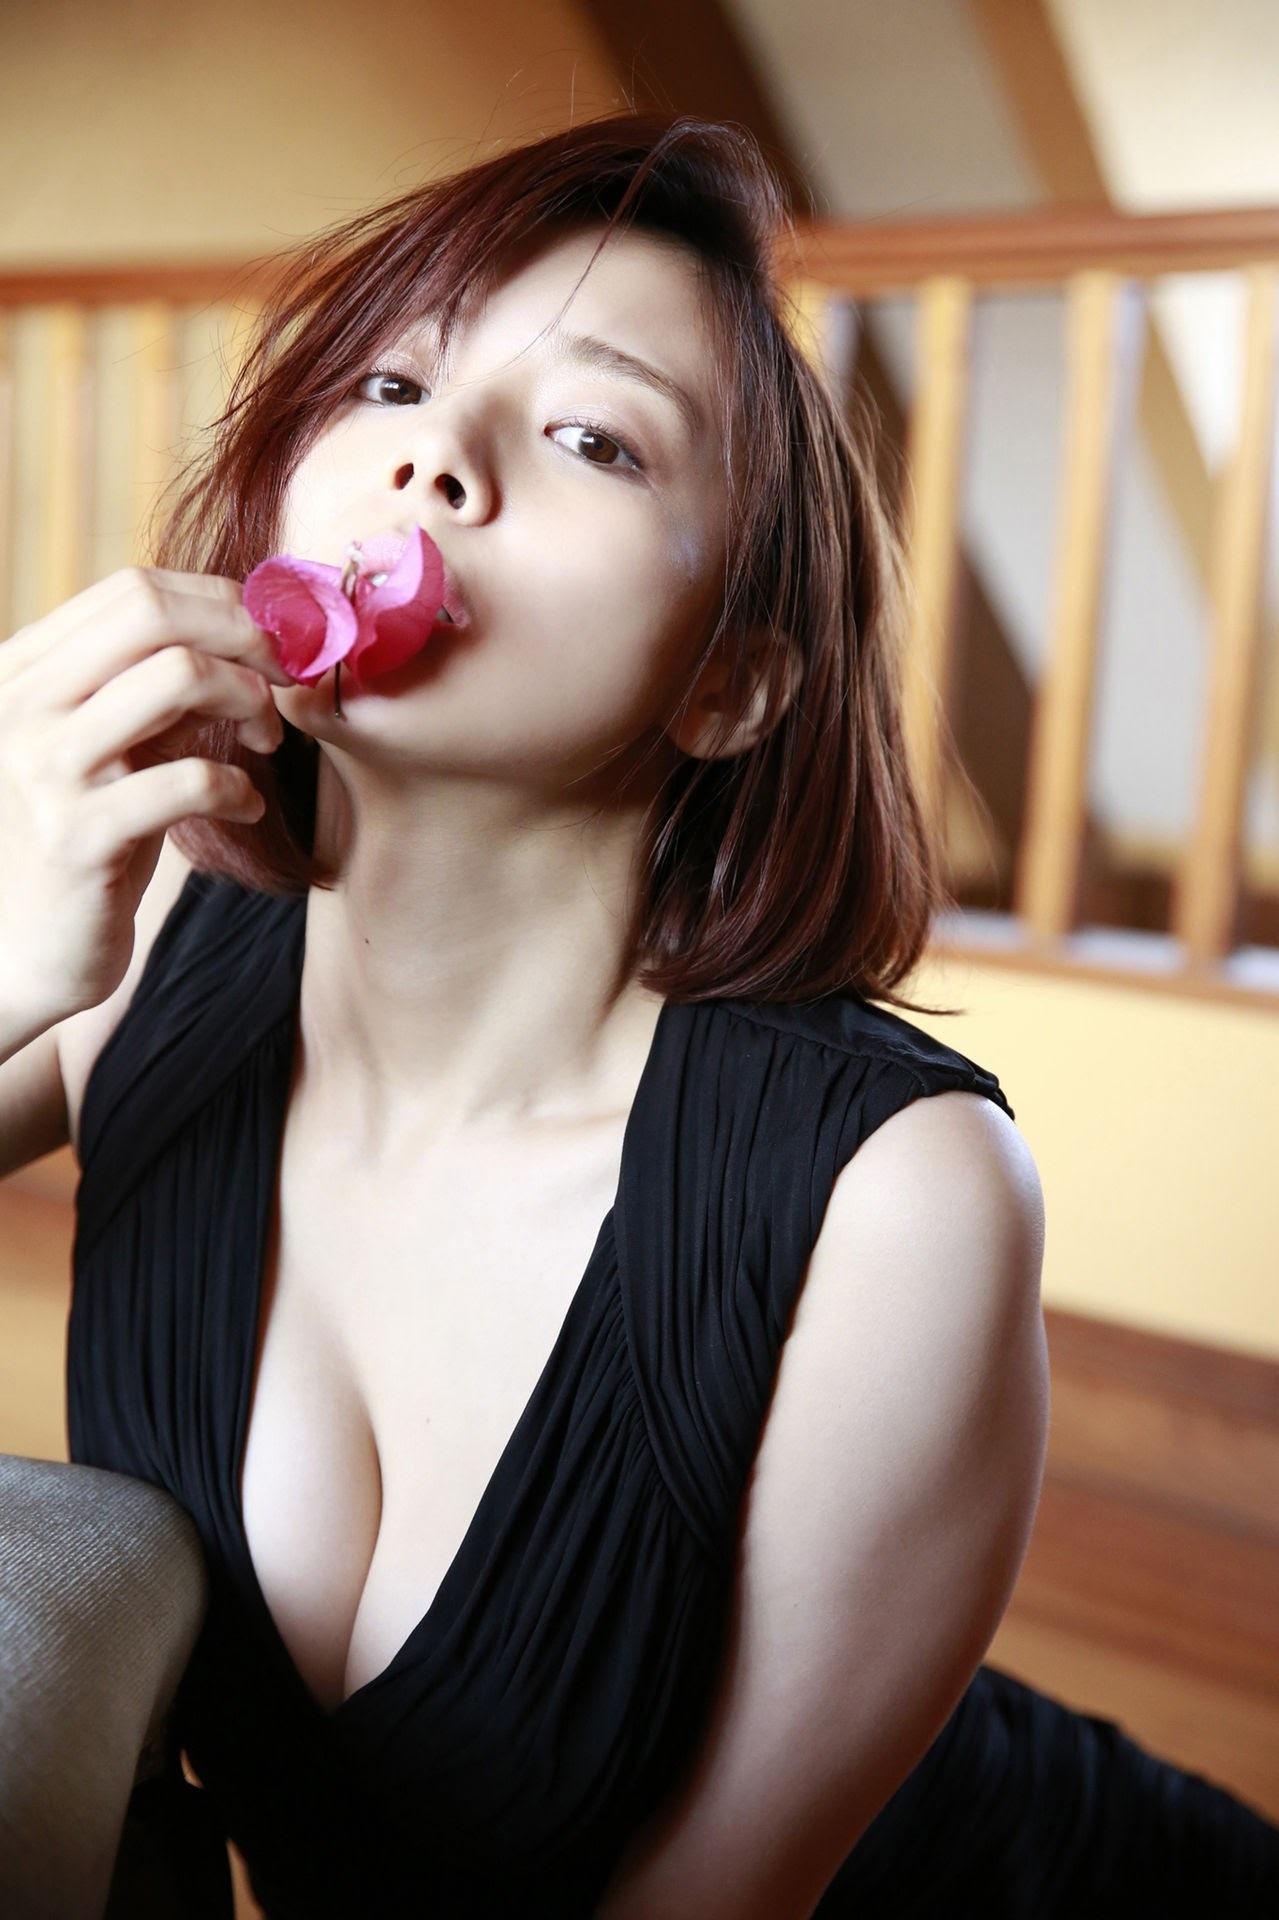 23 years old Shaka Okada, who is also a professional mahjong player056